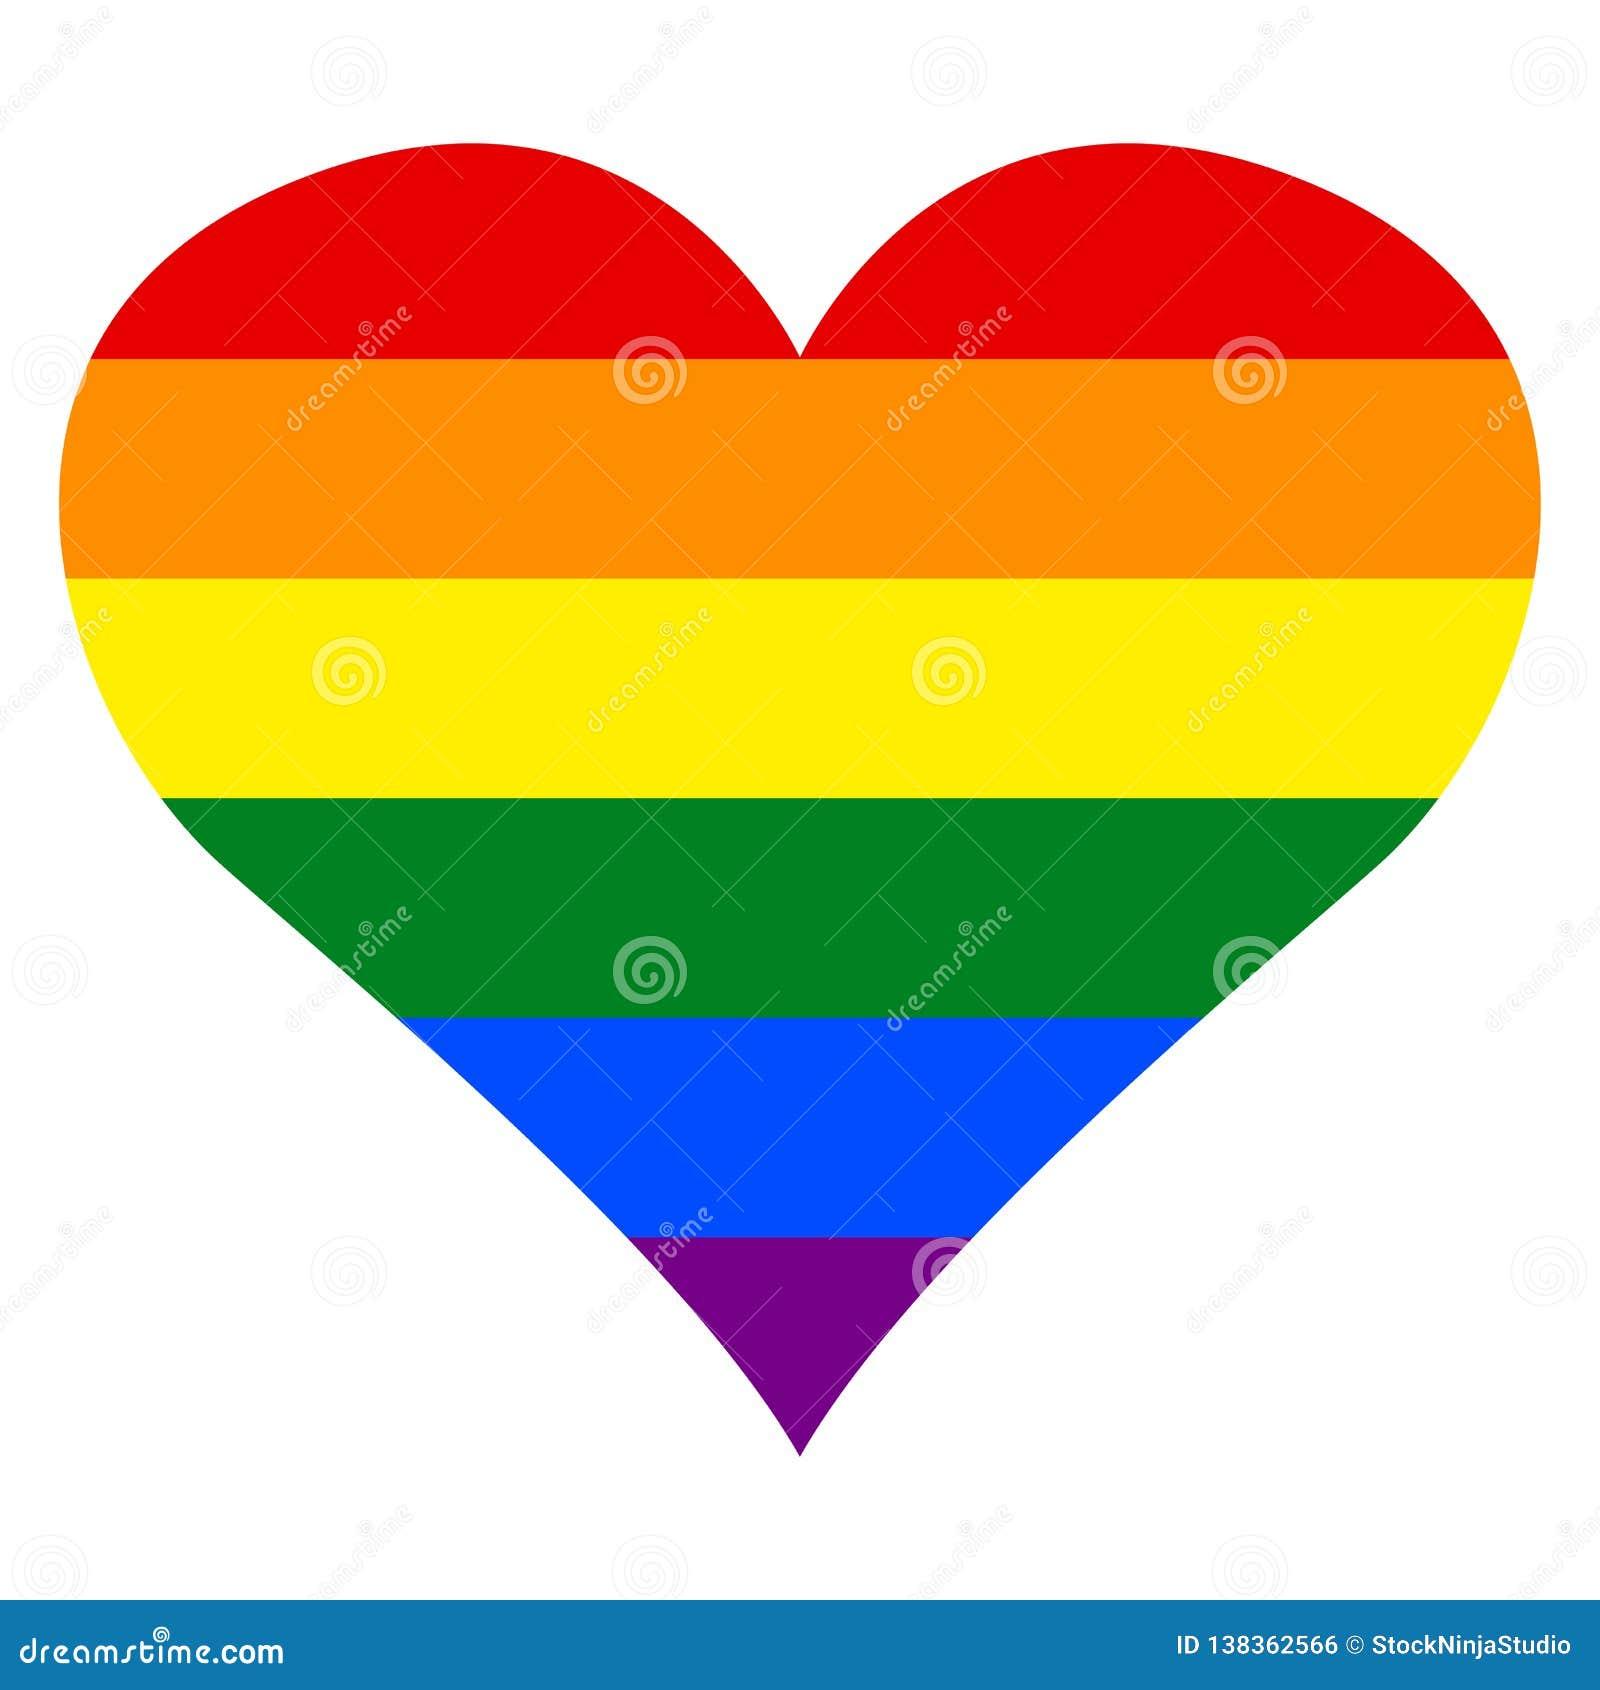 Lesbian, gay, bisexual, transgender LGBT pride heart